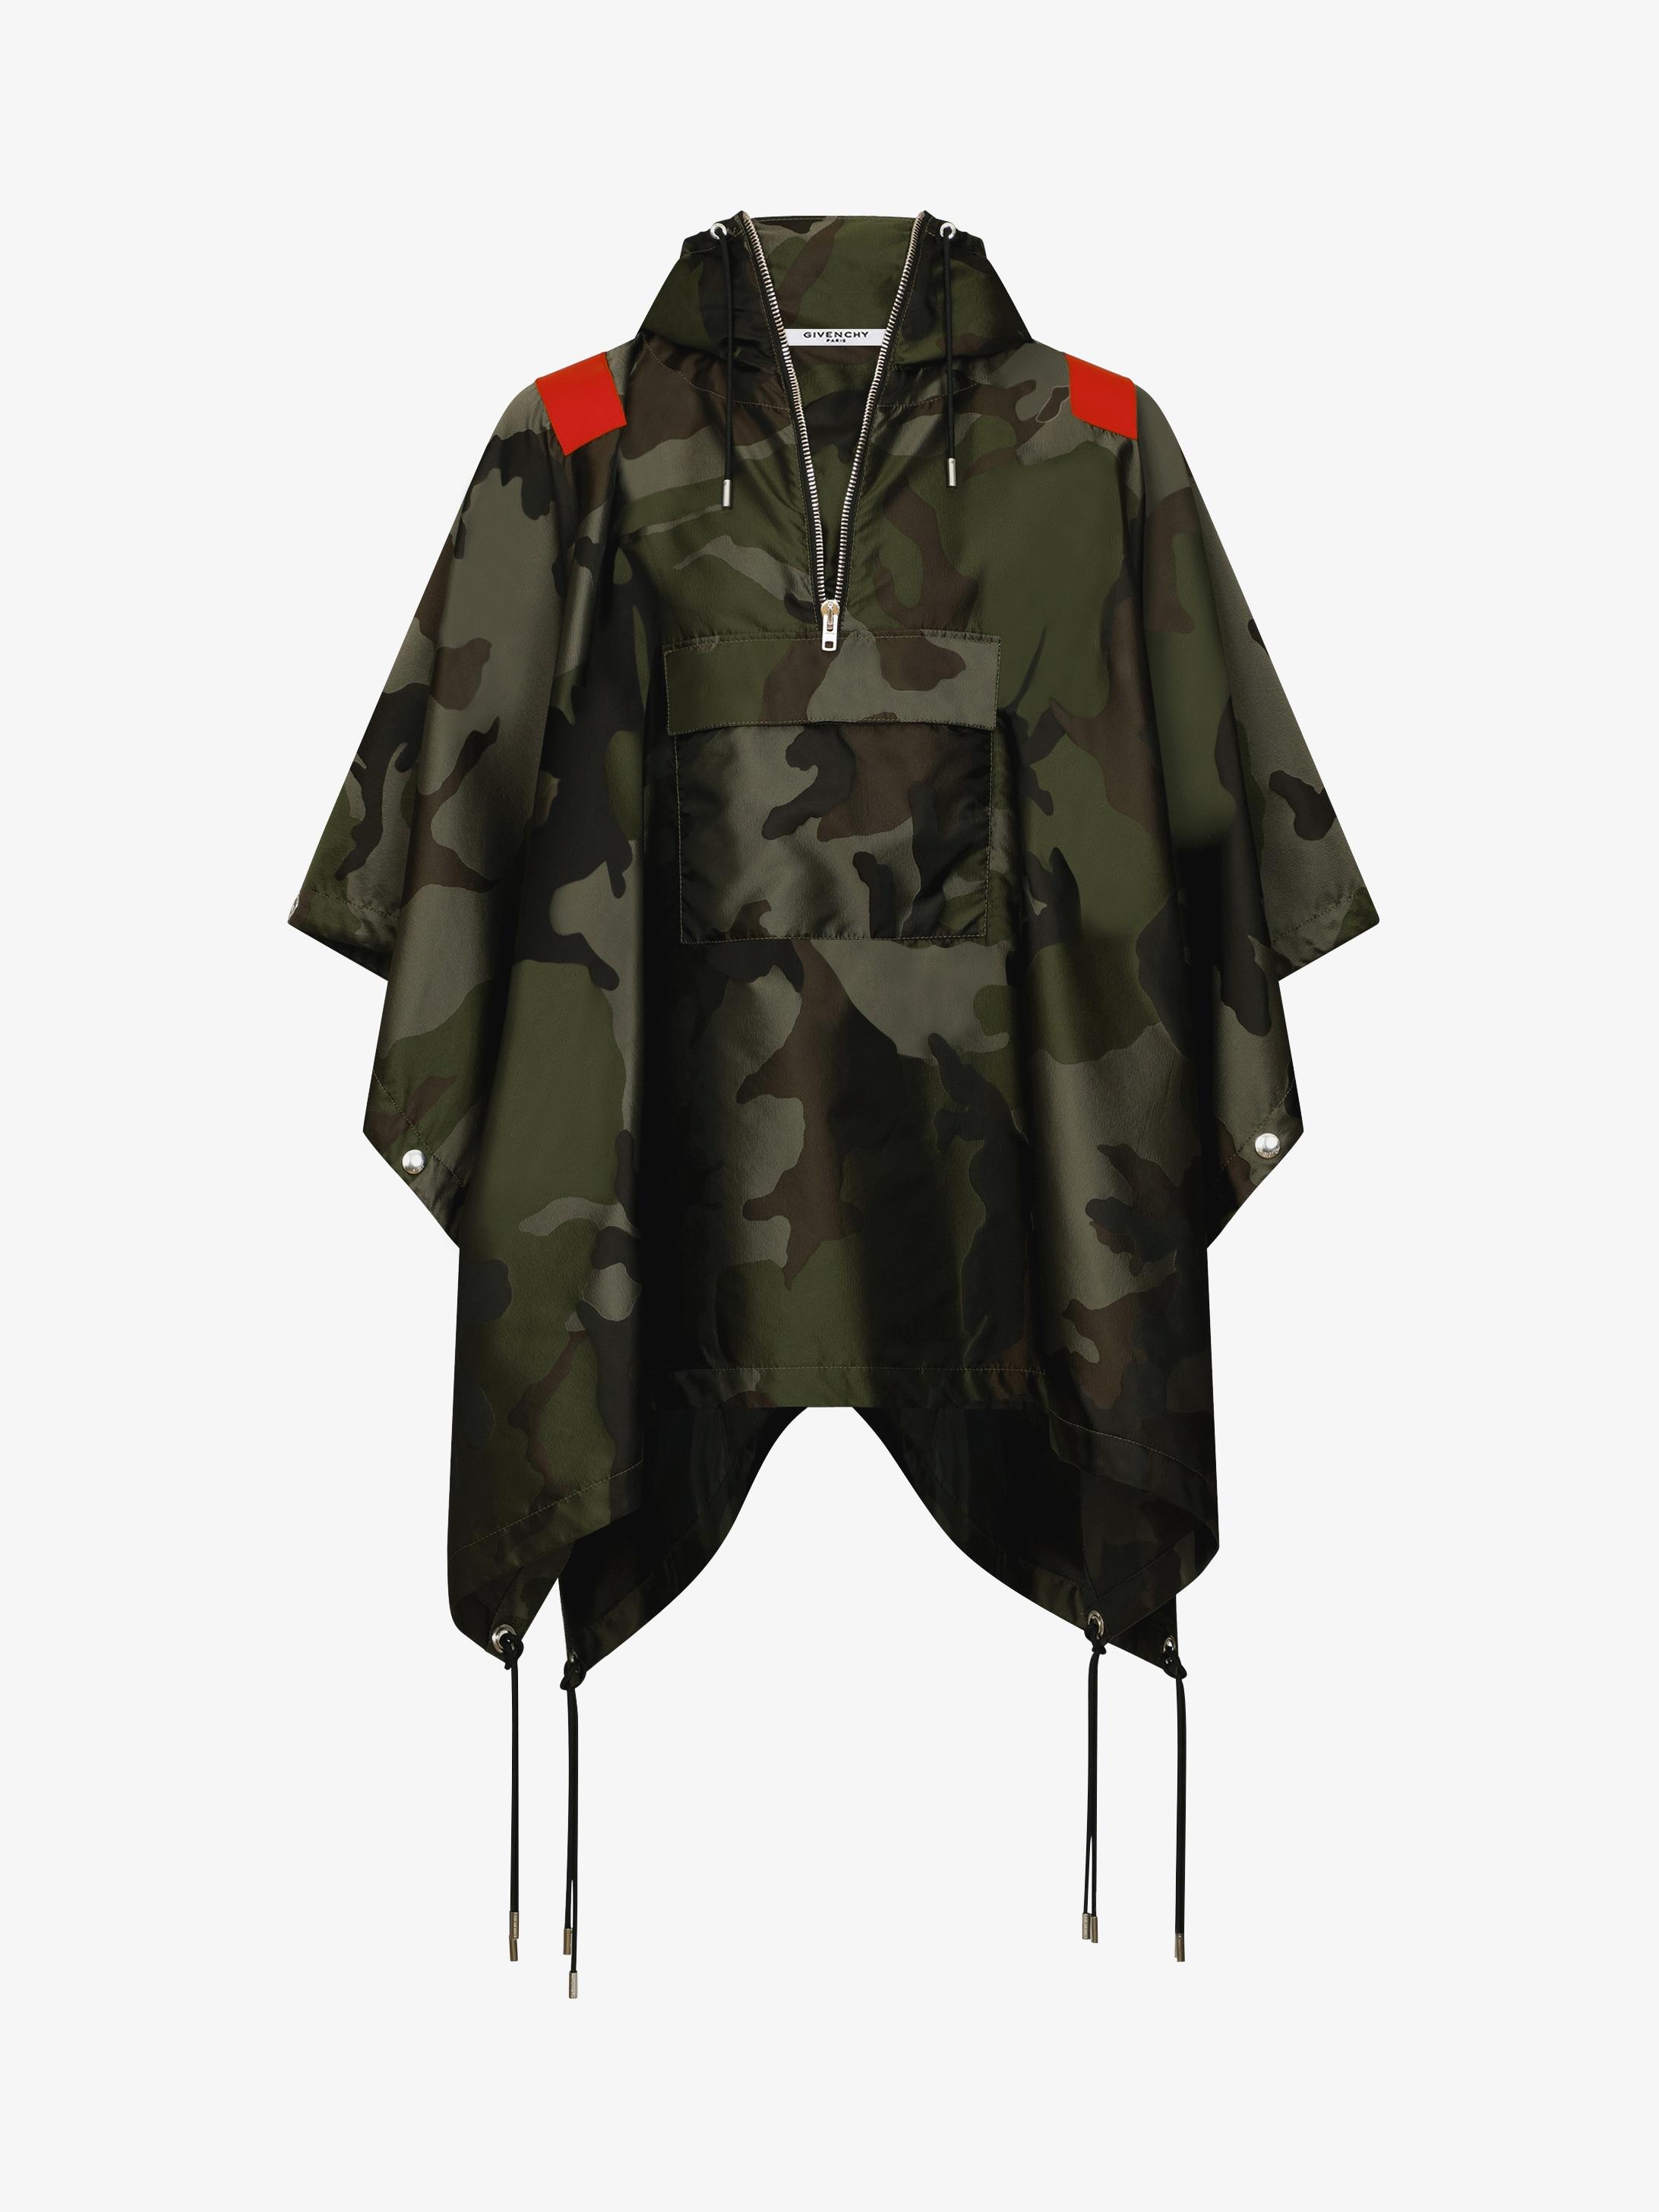 Military camo printed windbreaker